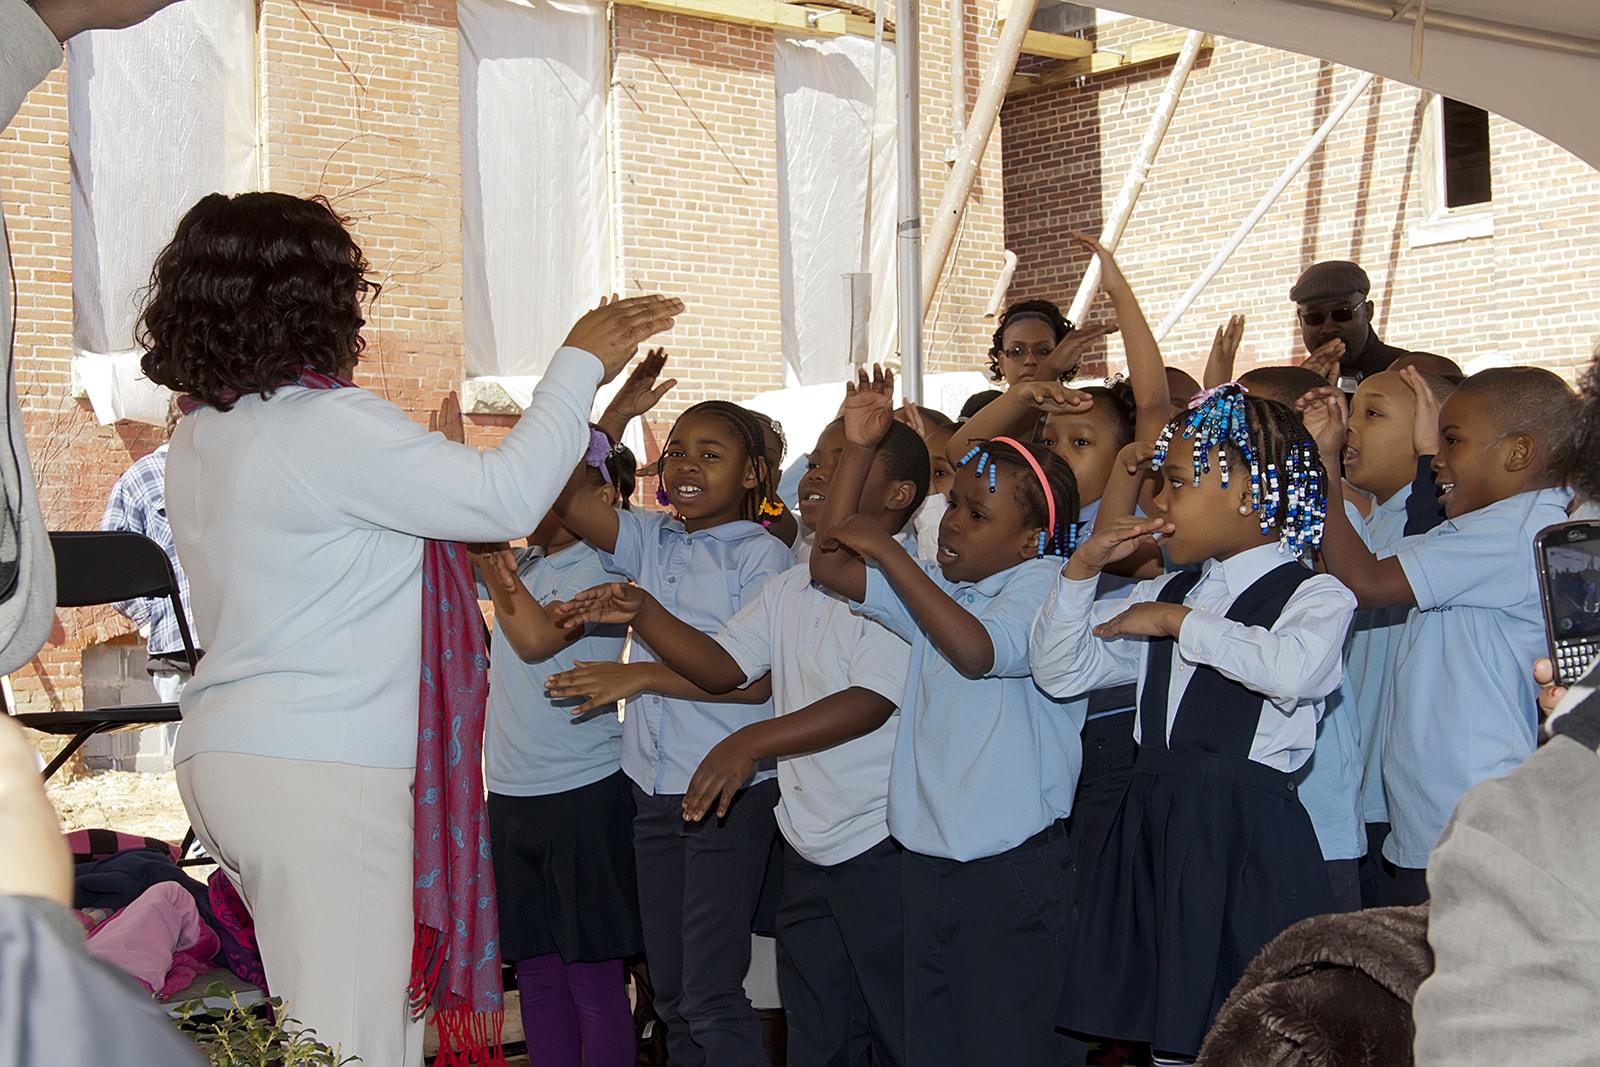 columbus school apt019.jpg